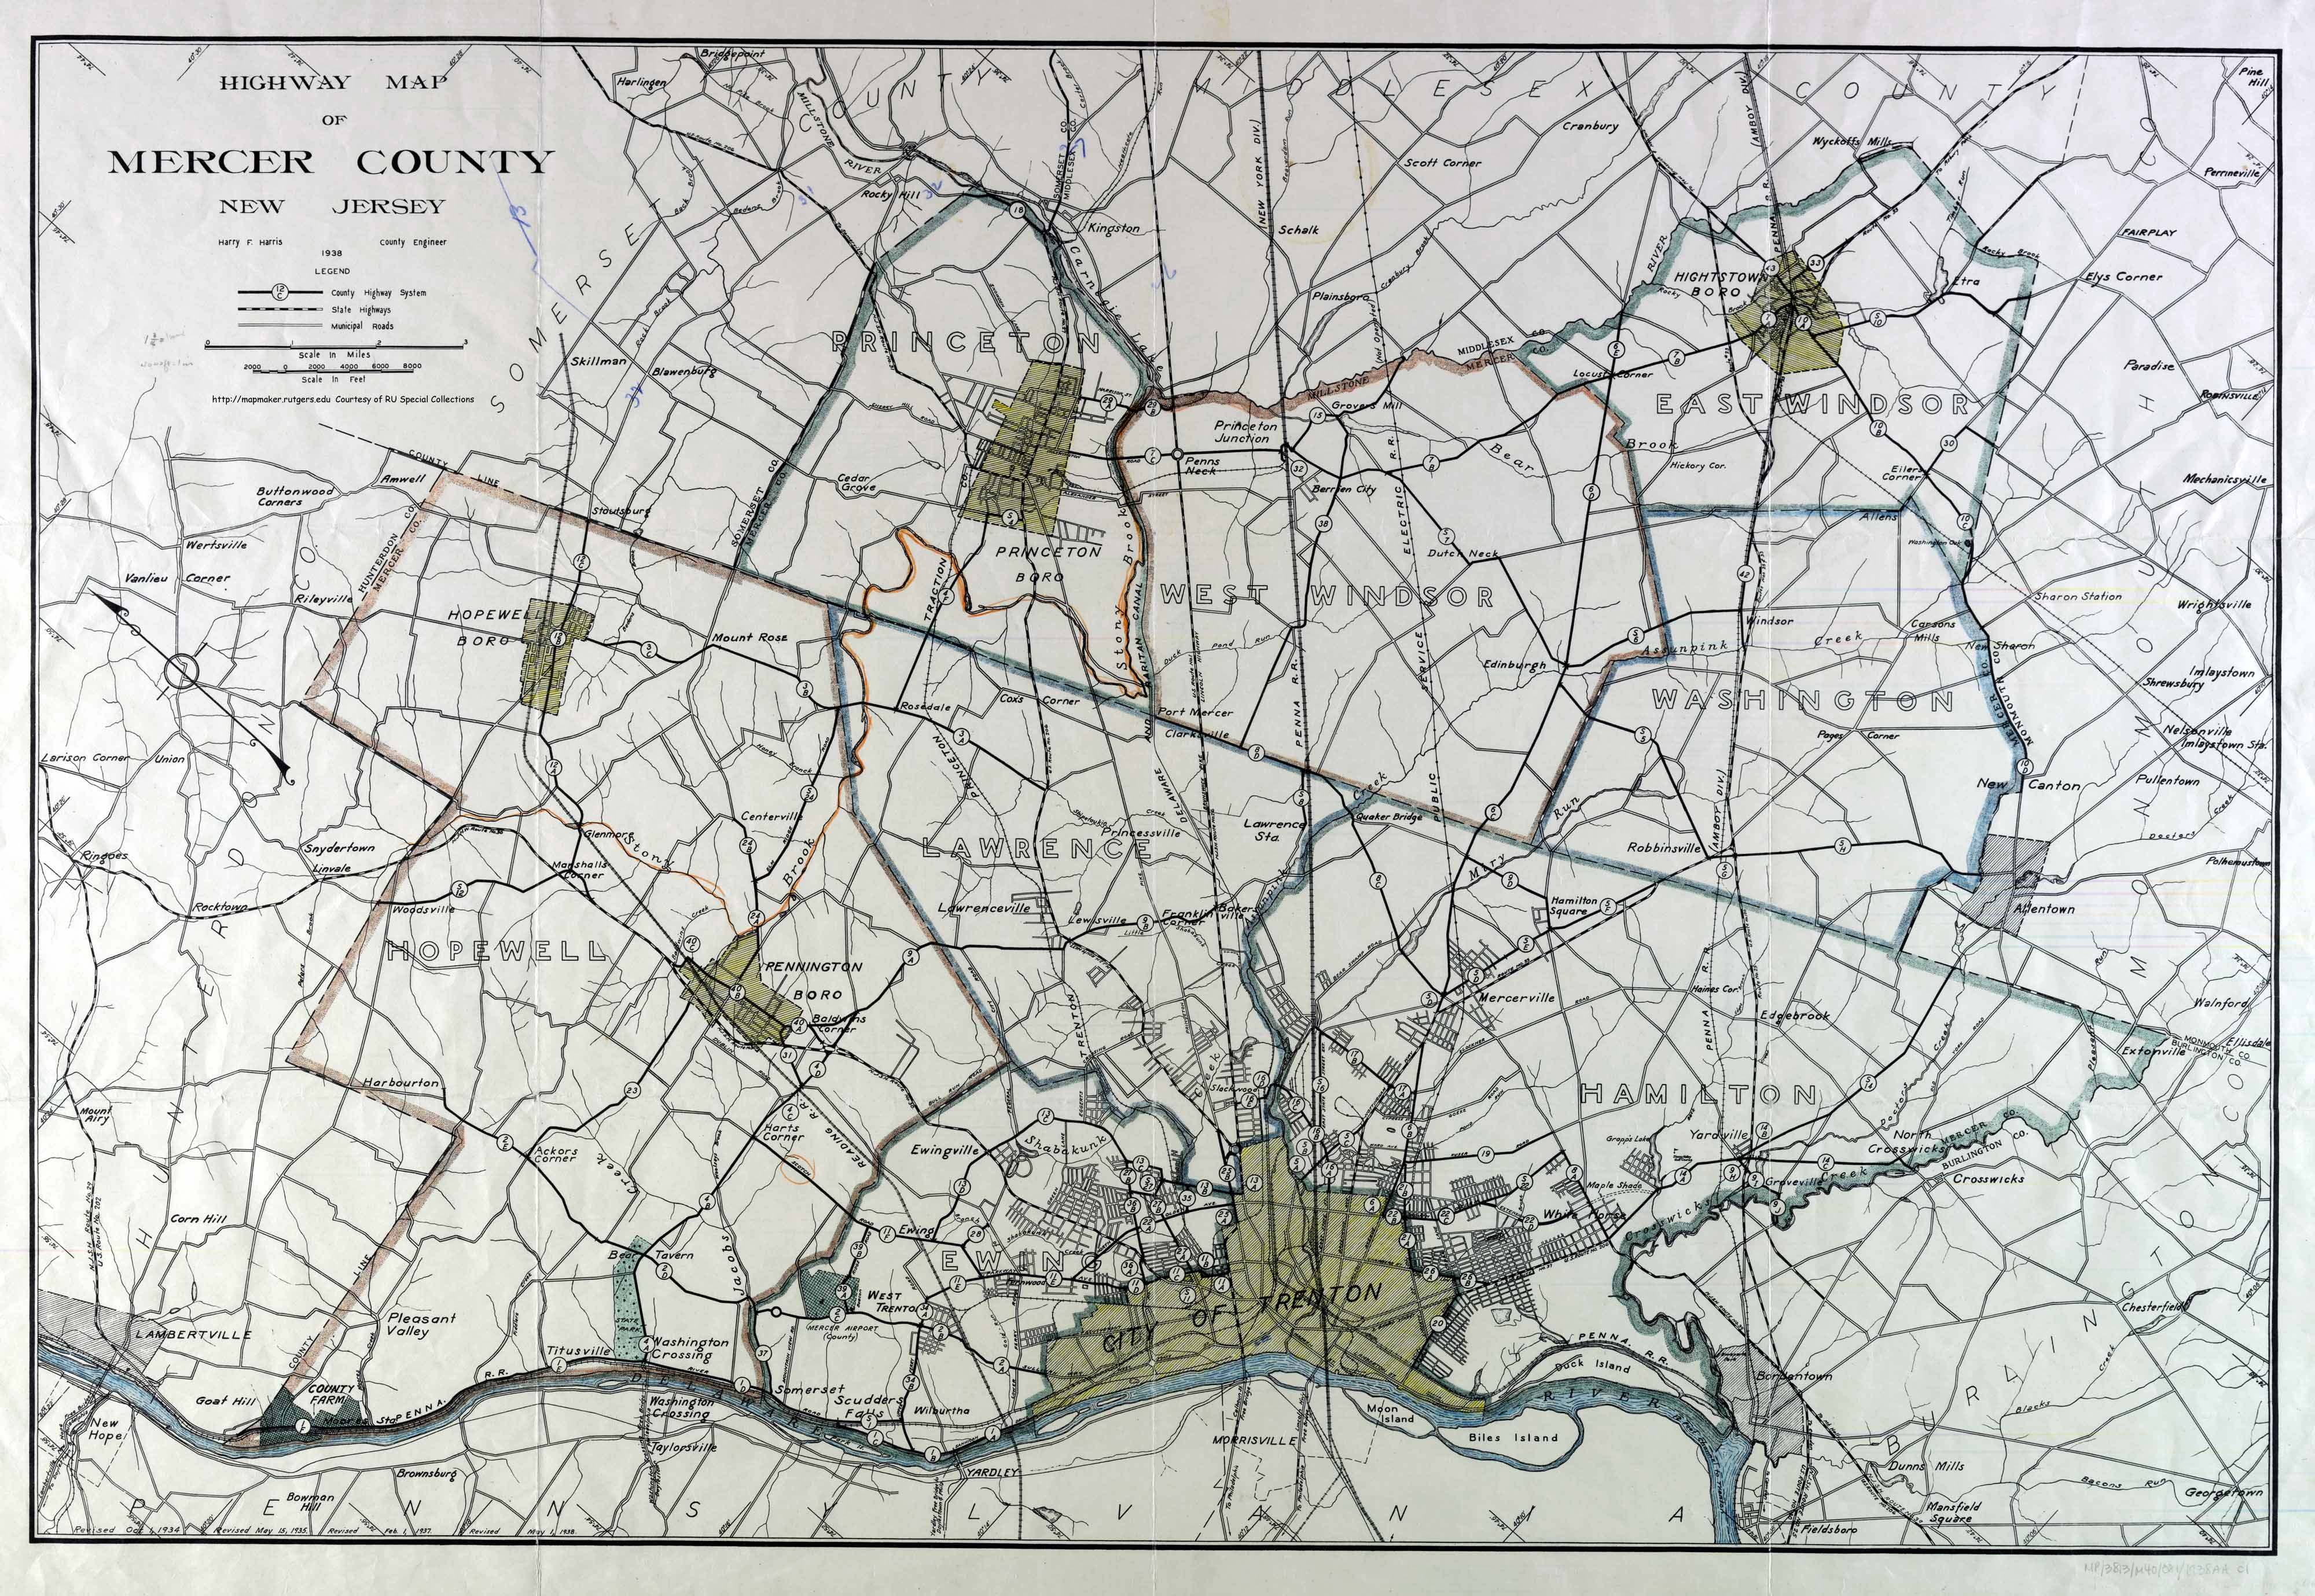 Maps Mercer County 1938